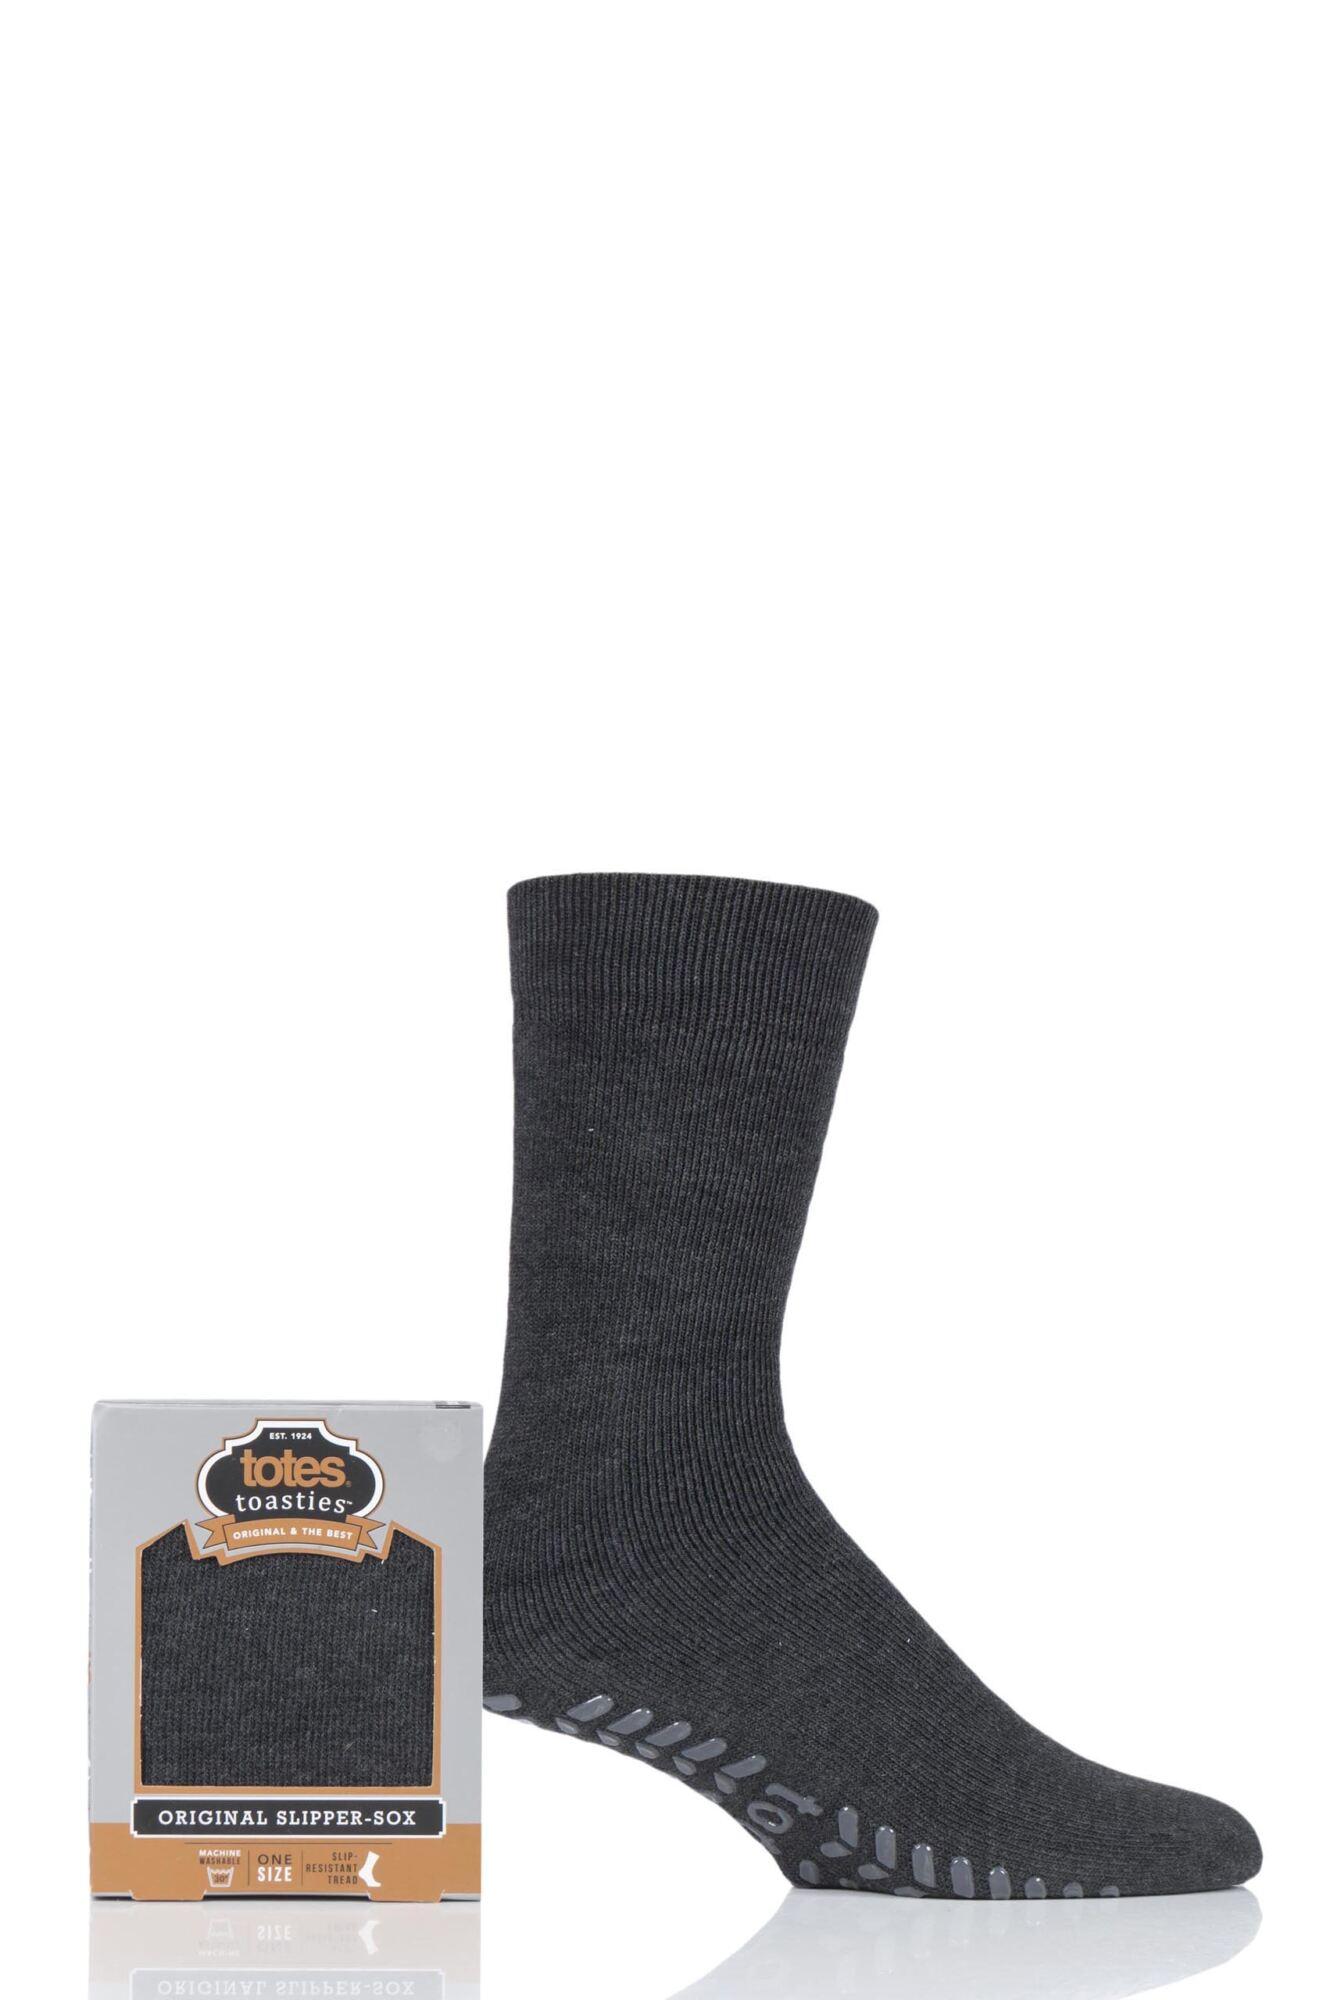 1 Pair Originals Slipper Socks Men's - Totes